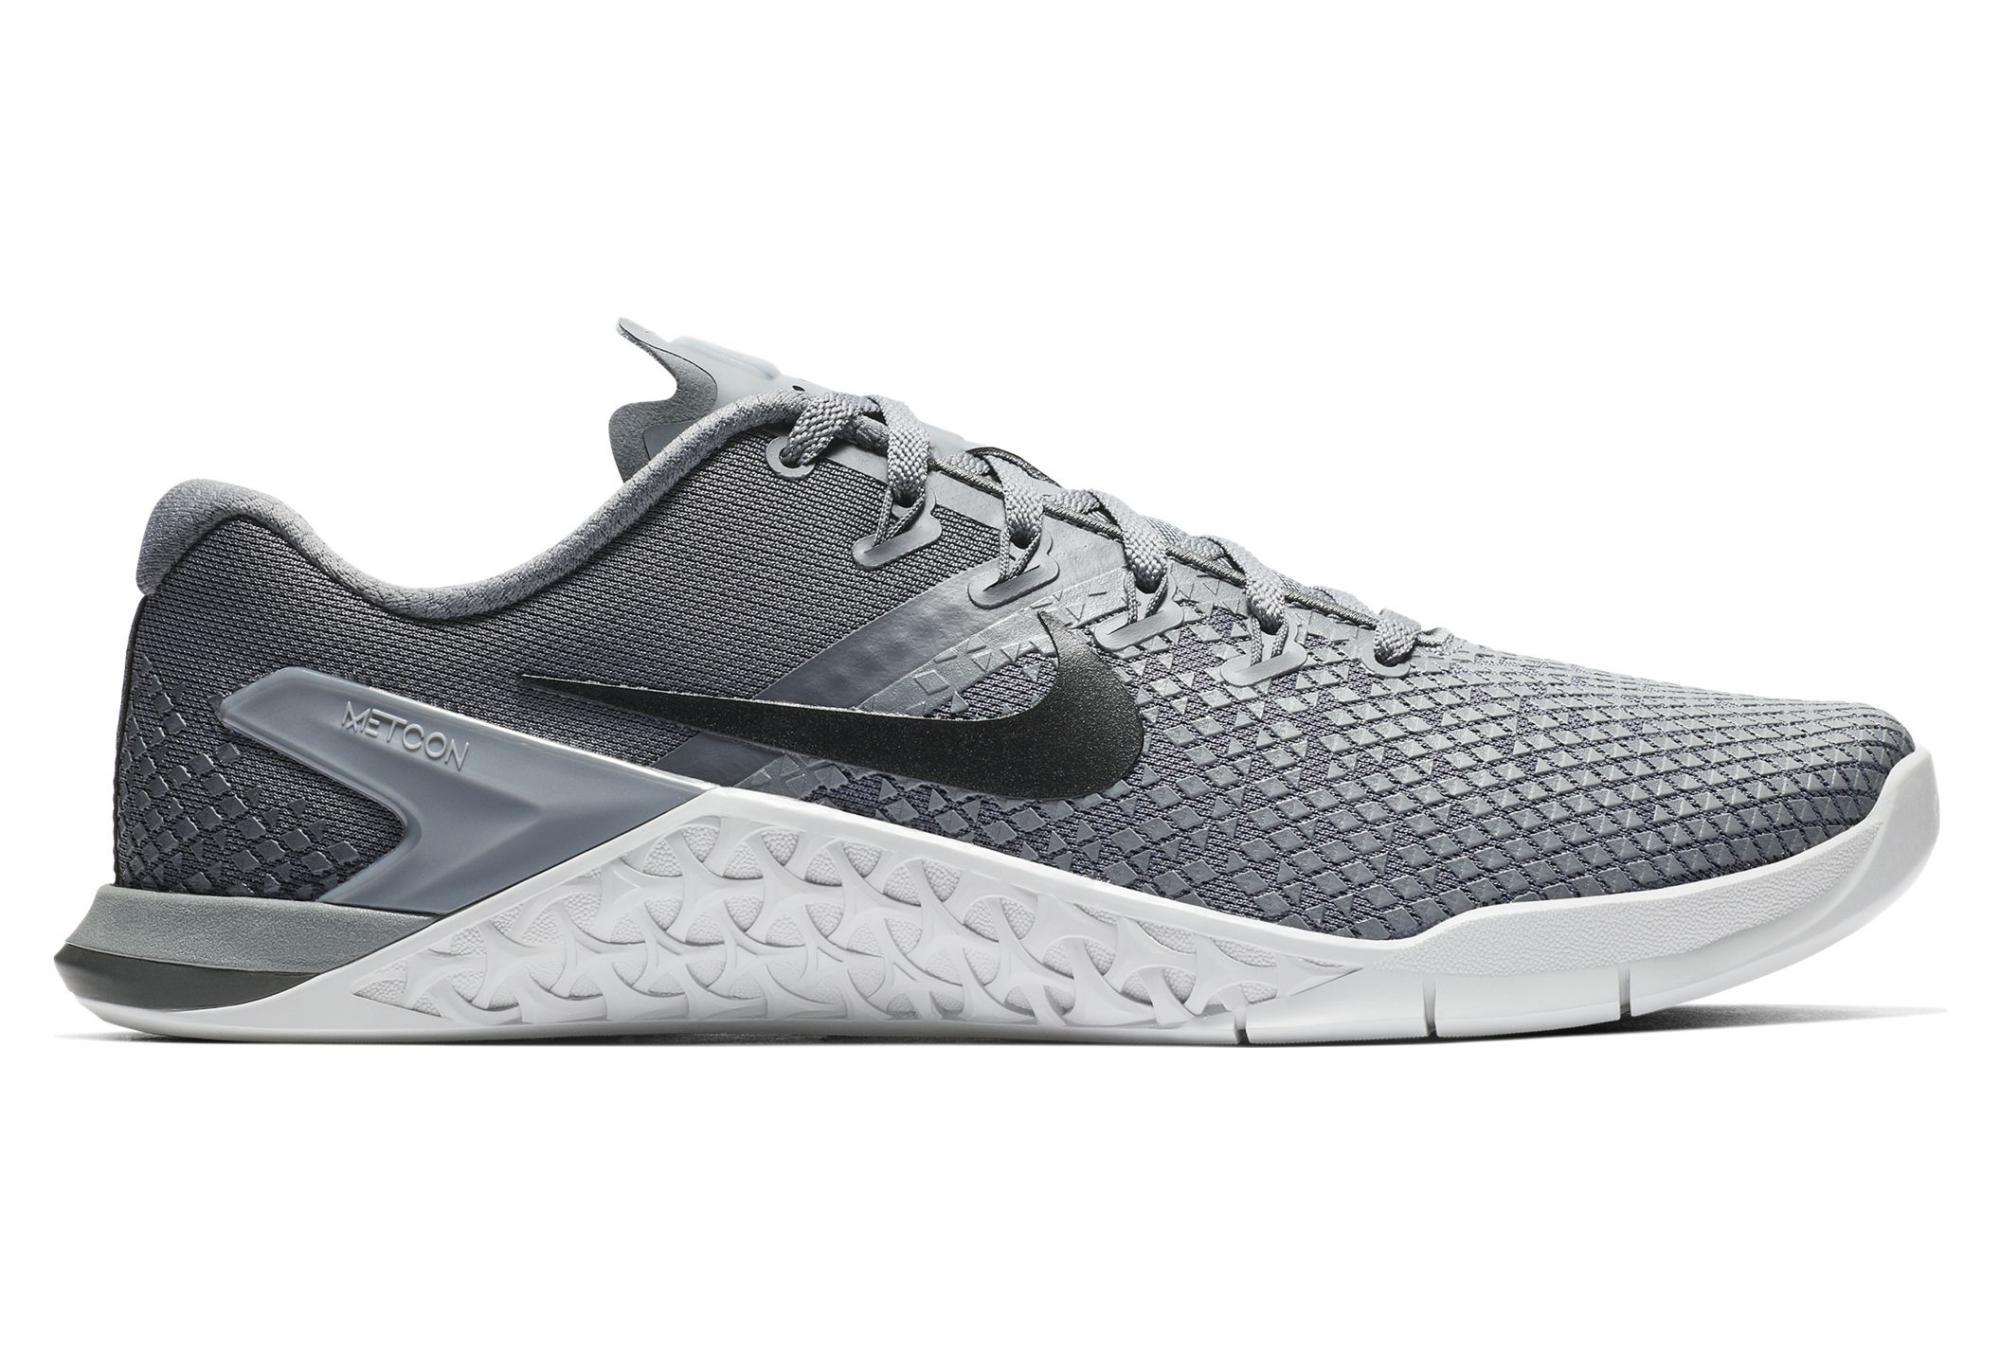 Nike Metcon 4 XD Grey Black Men